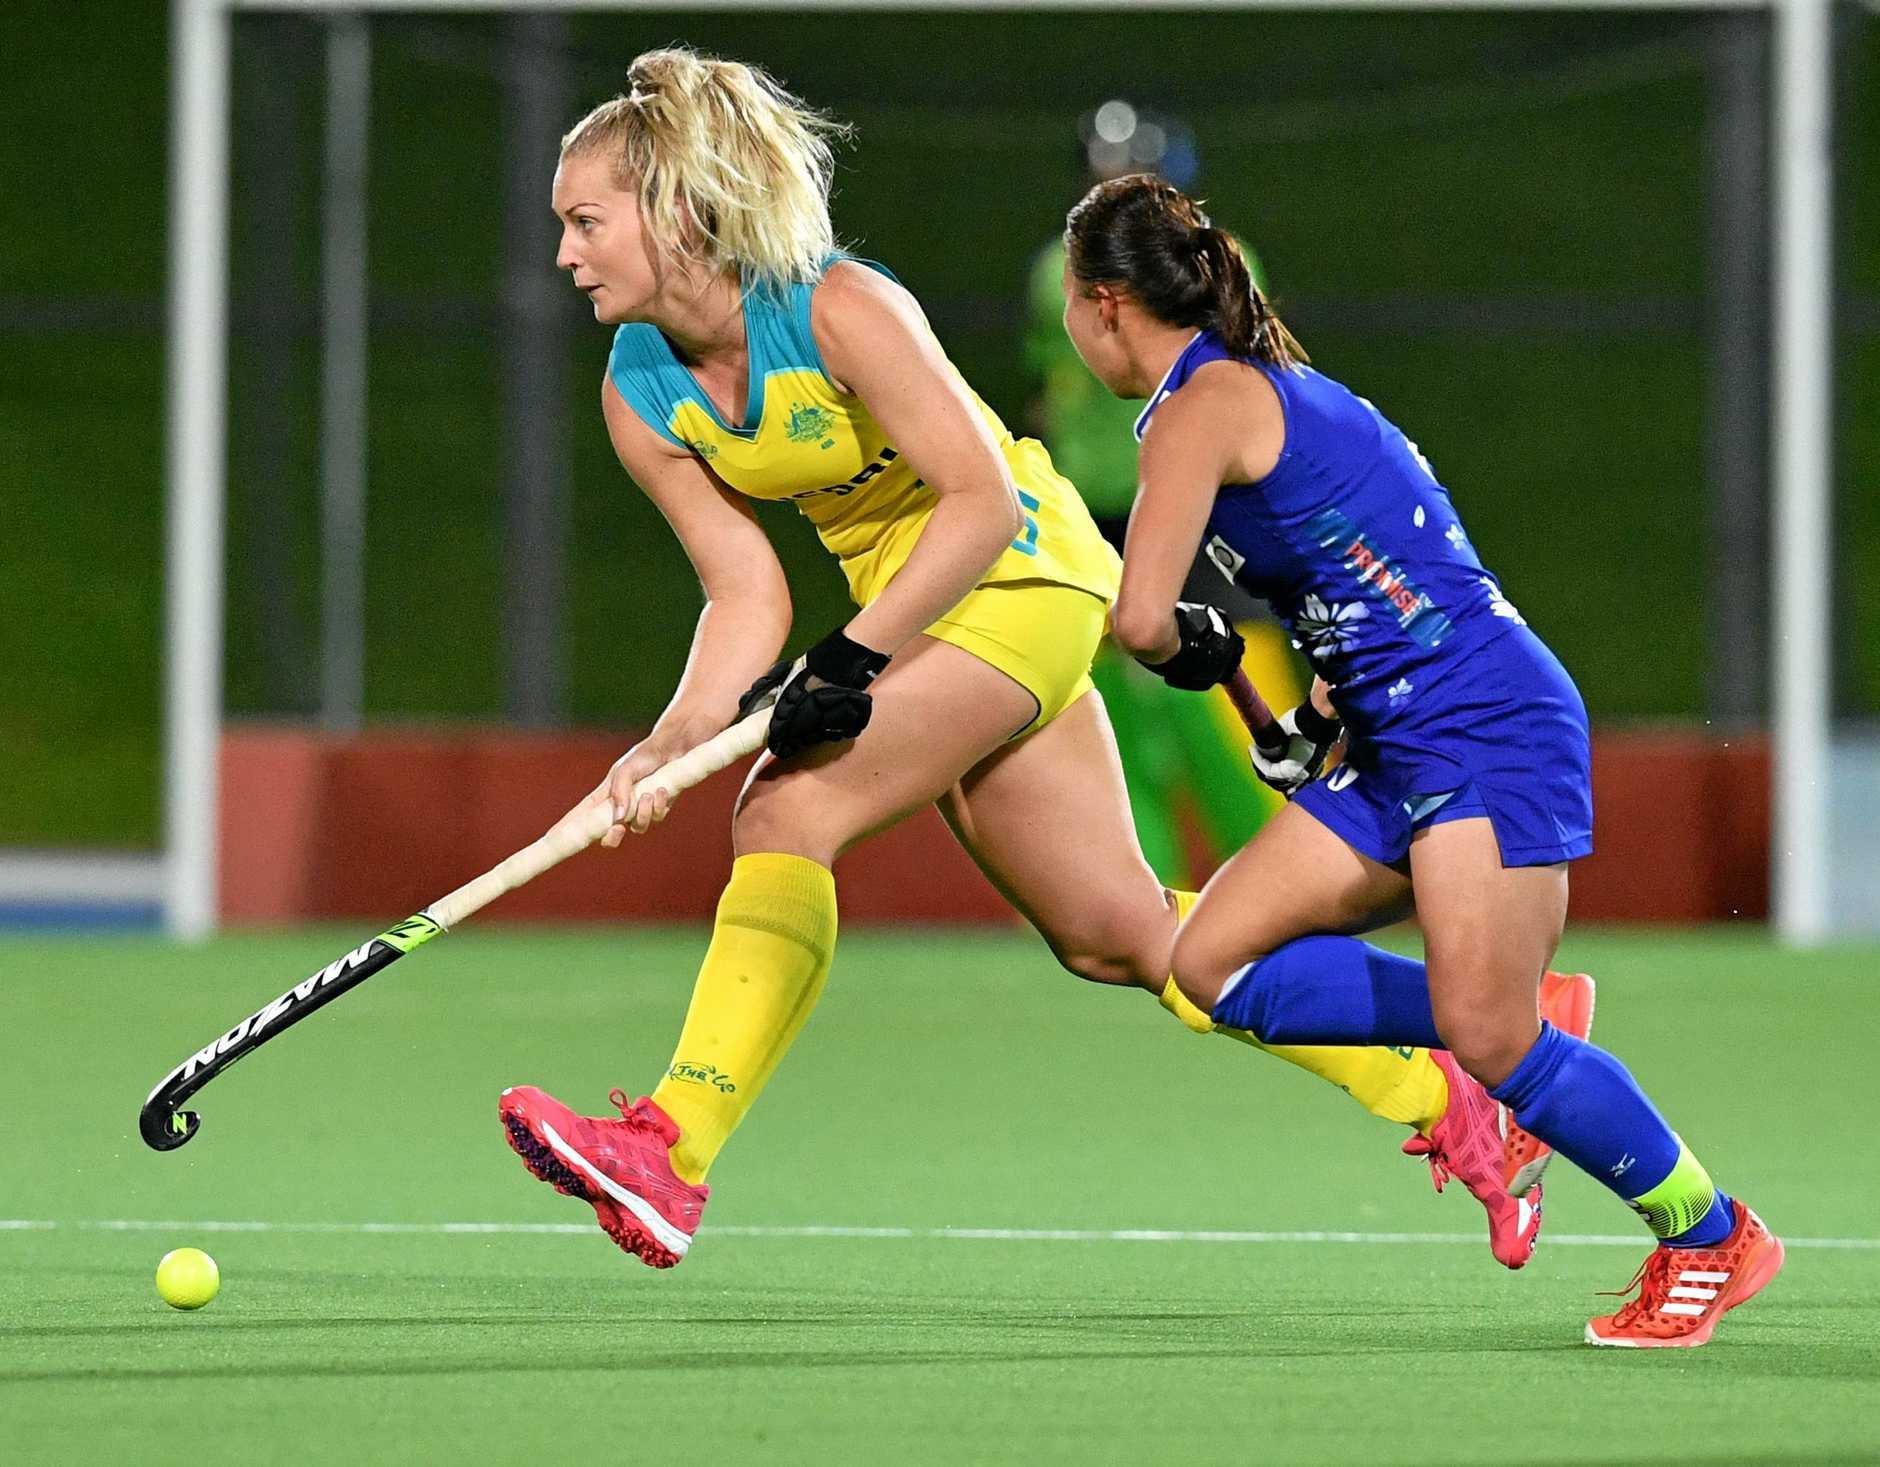 Sunshine Coast's Hockeyroo Ashlea Fey in action.